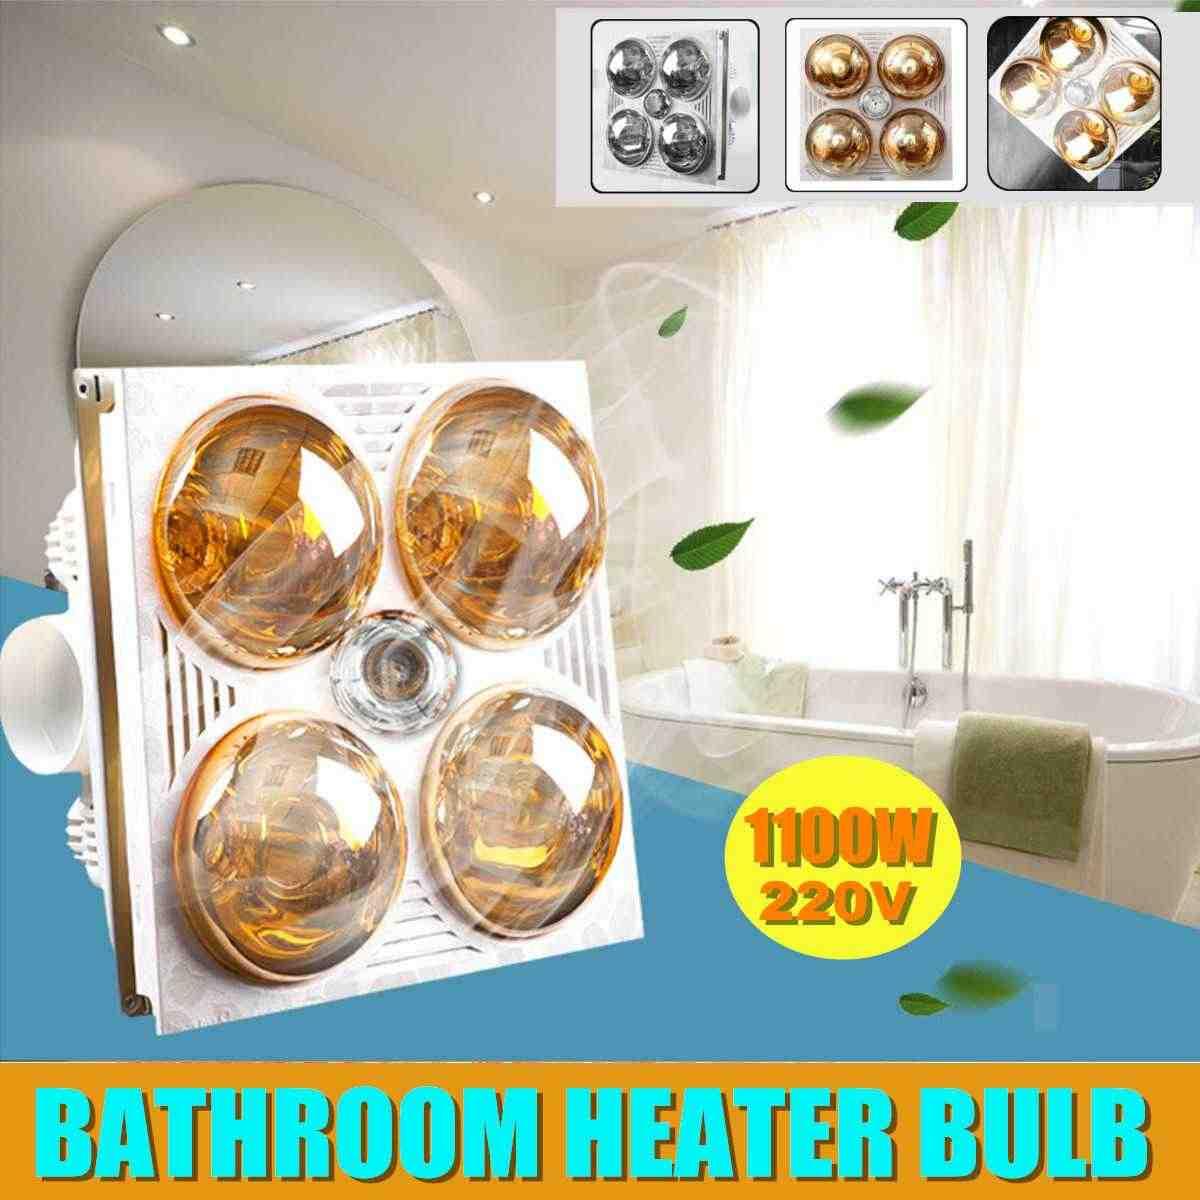 3 In 1 Multifunctional Bathroom Heater Exhaust Fan With 4 Heating